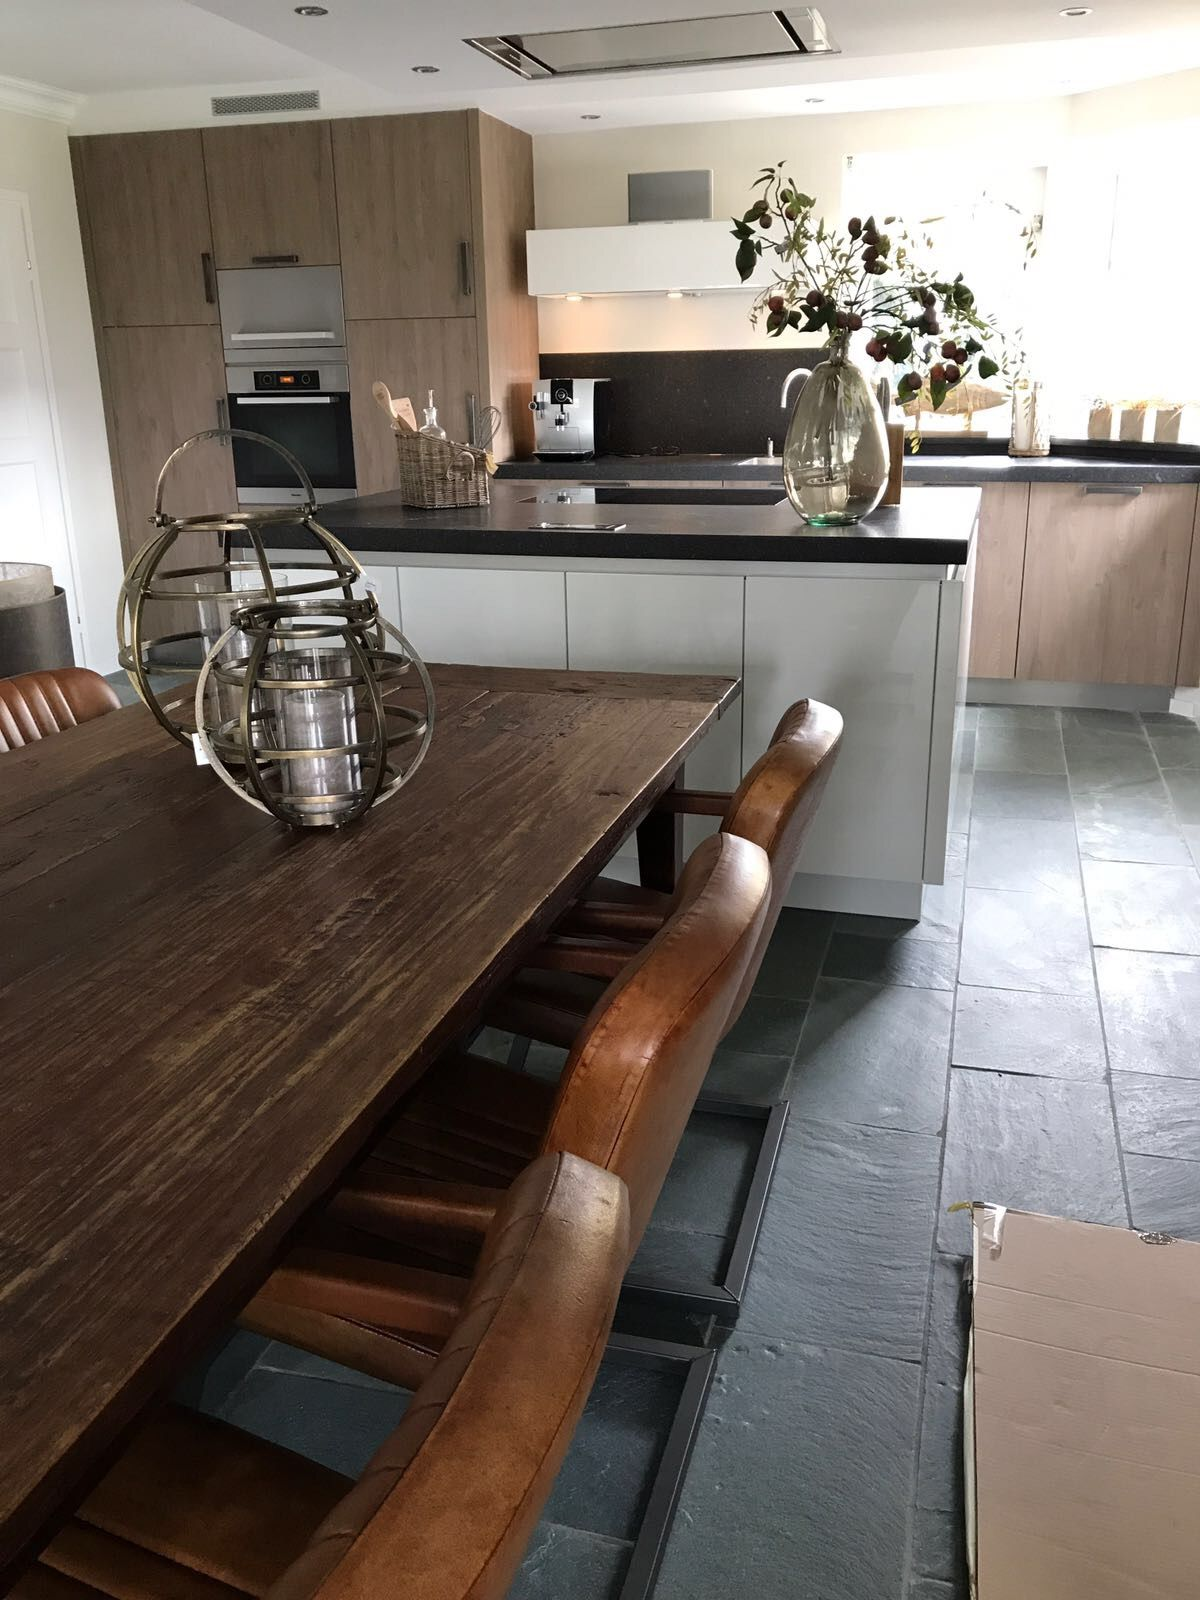 Maison Manon - Borne, Eetkamer tafel hardhout met leren industriële ...